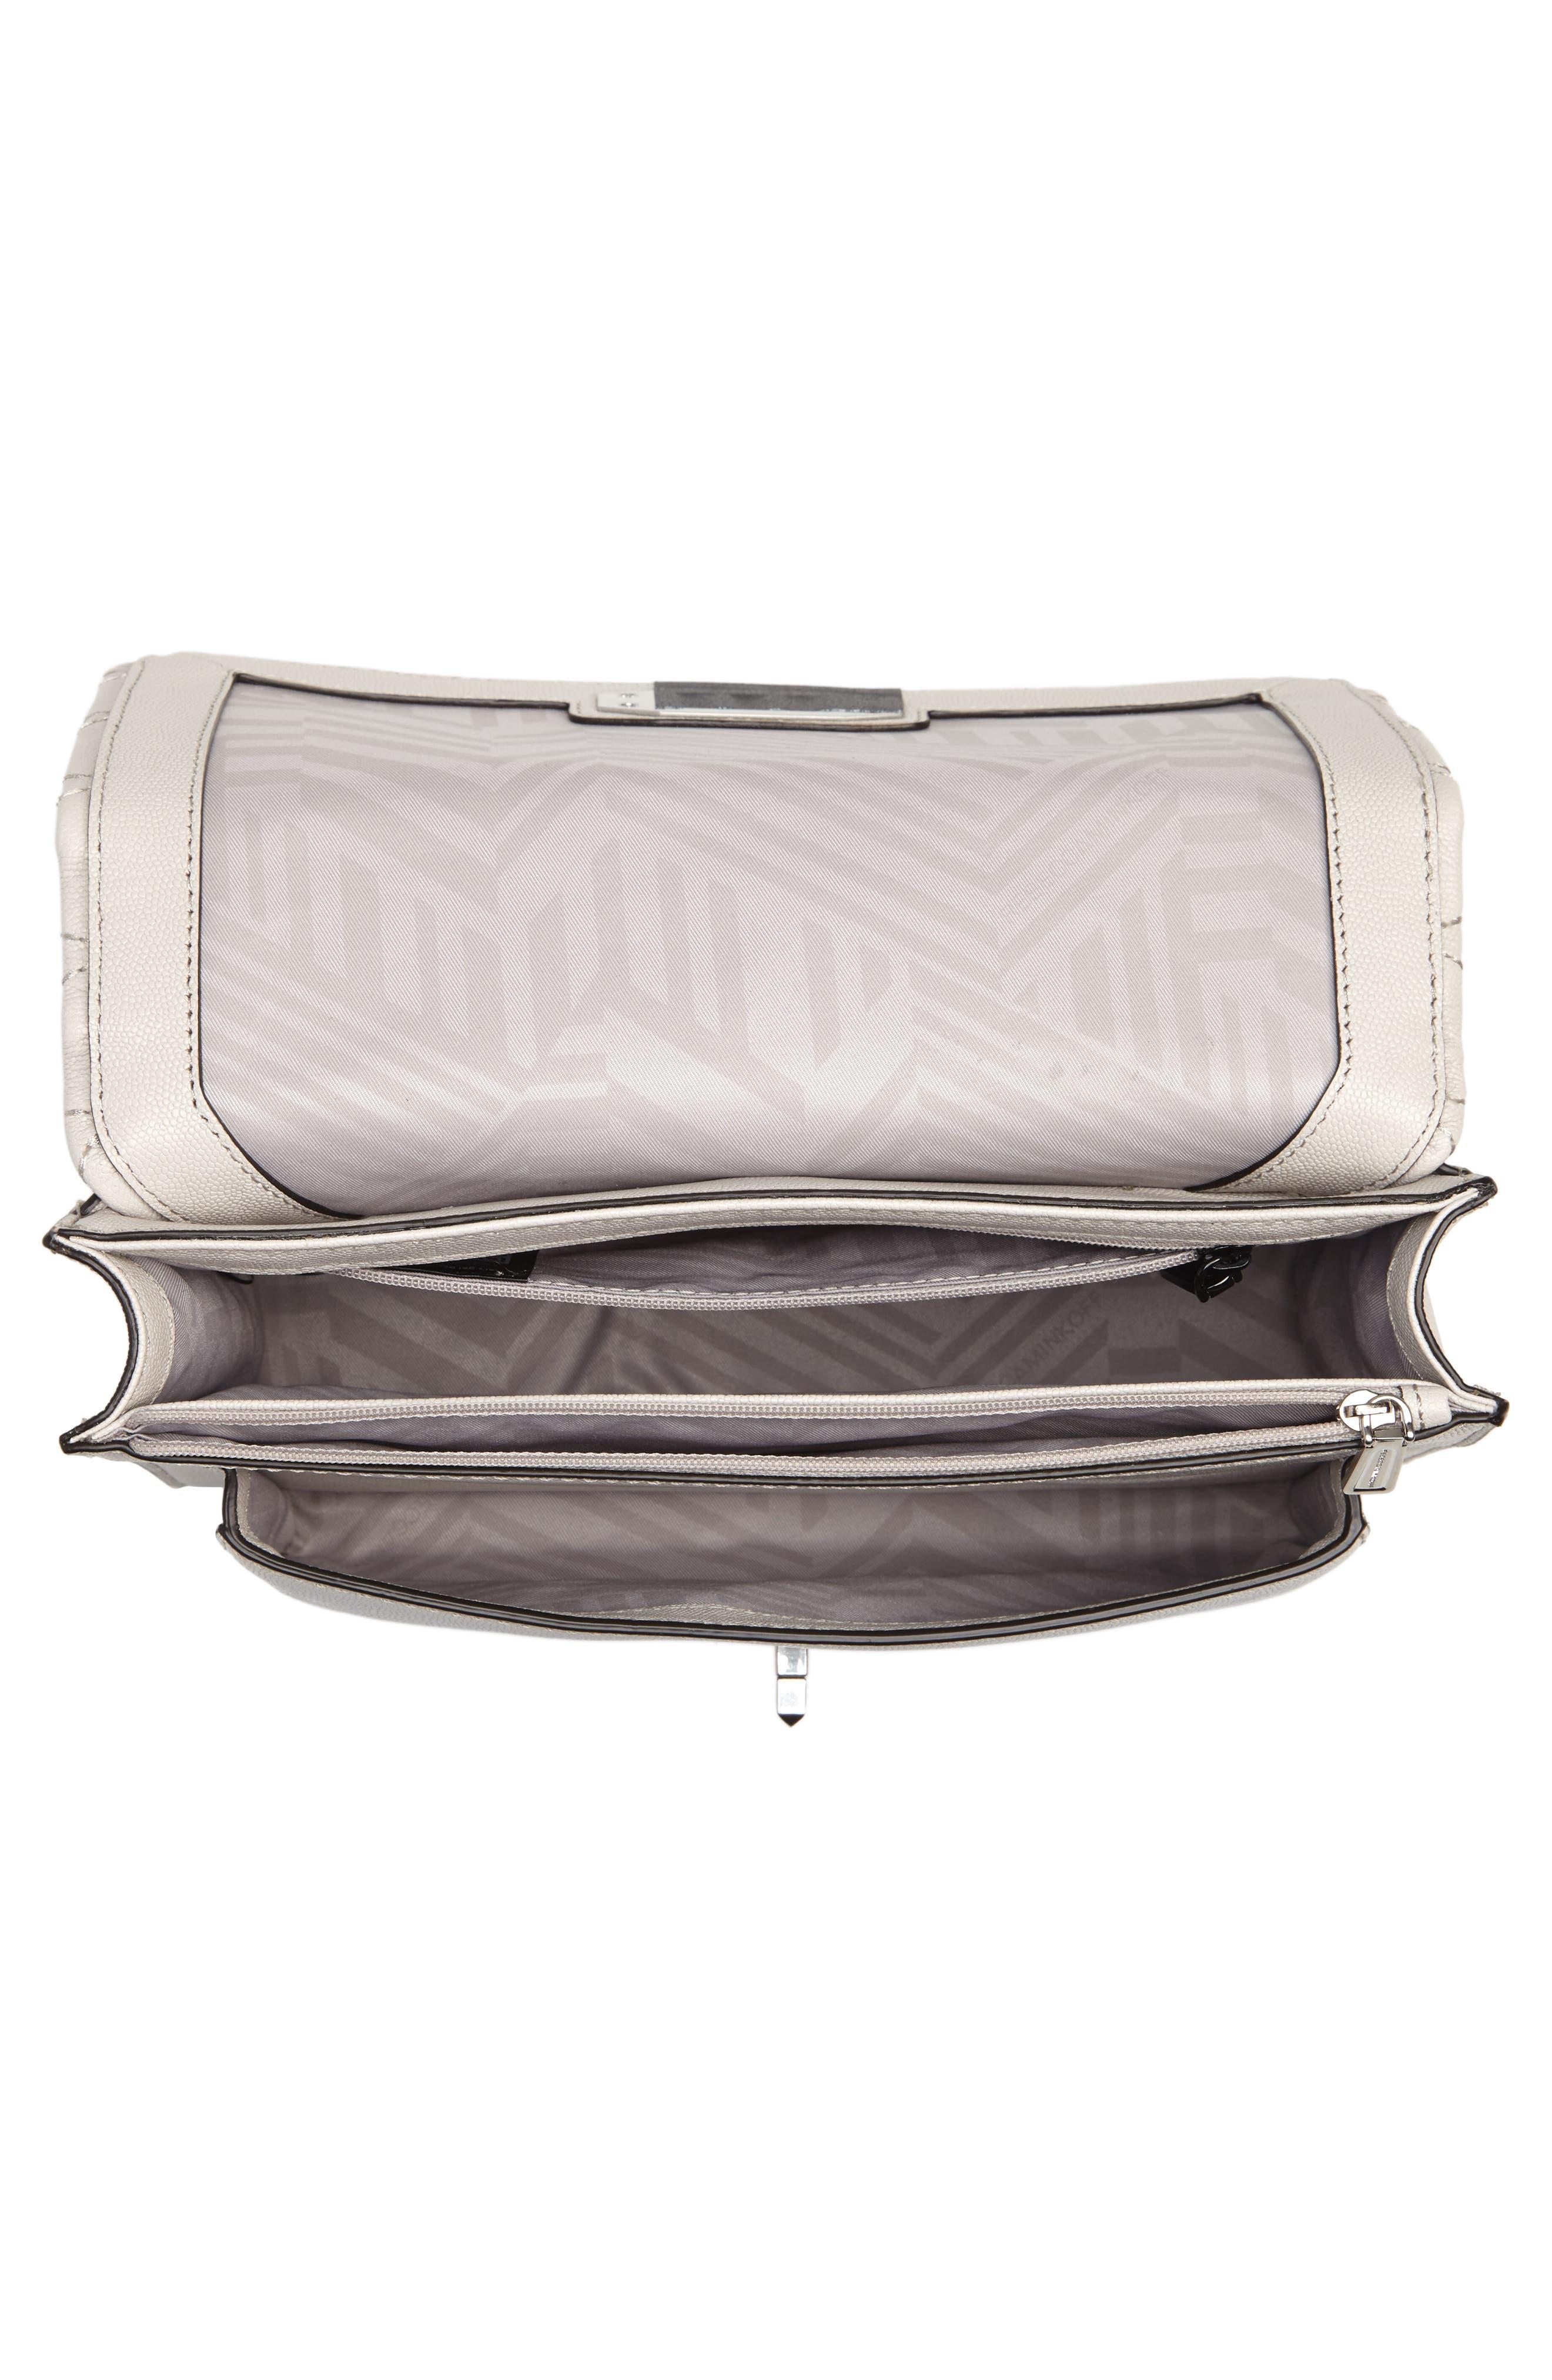 Medium Je T'aime Convertible Leather Crossbody Bag,                             Alternate thumbnail 4, color,                             Putty